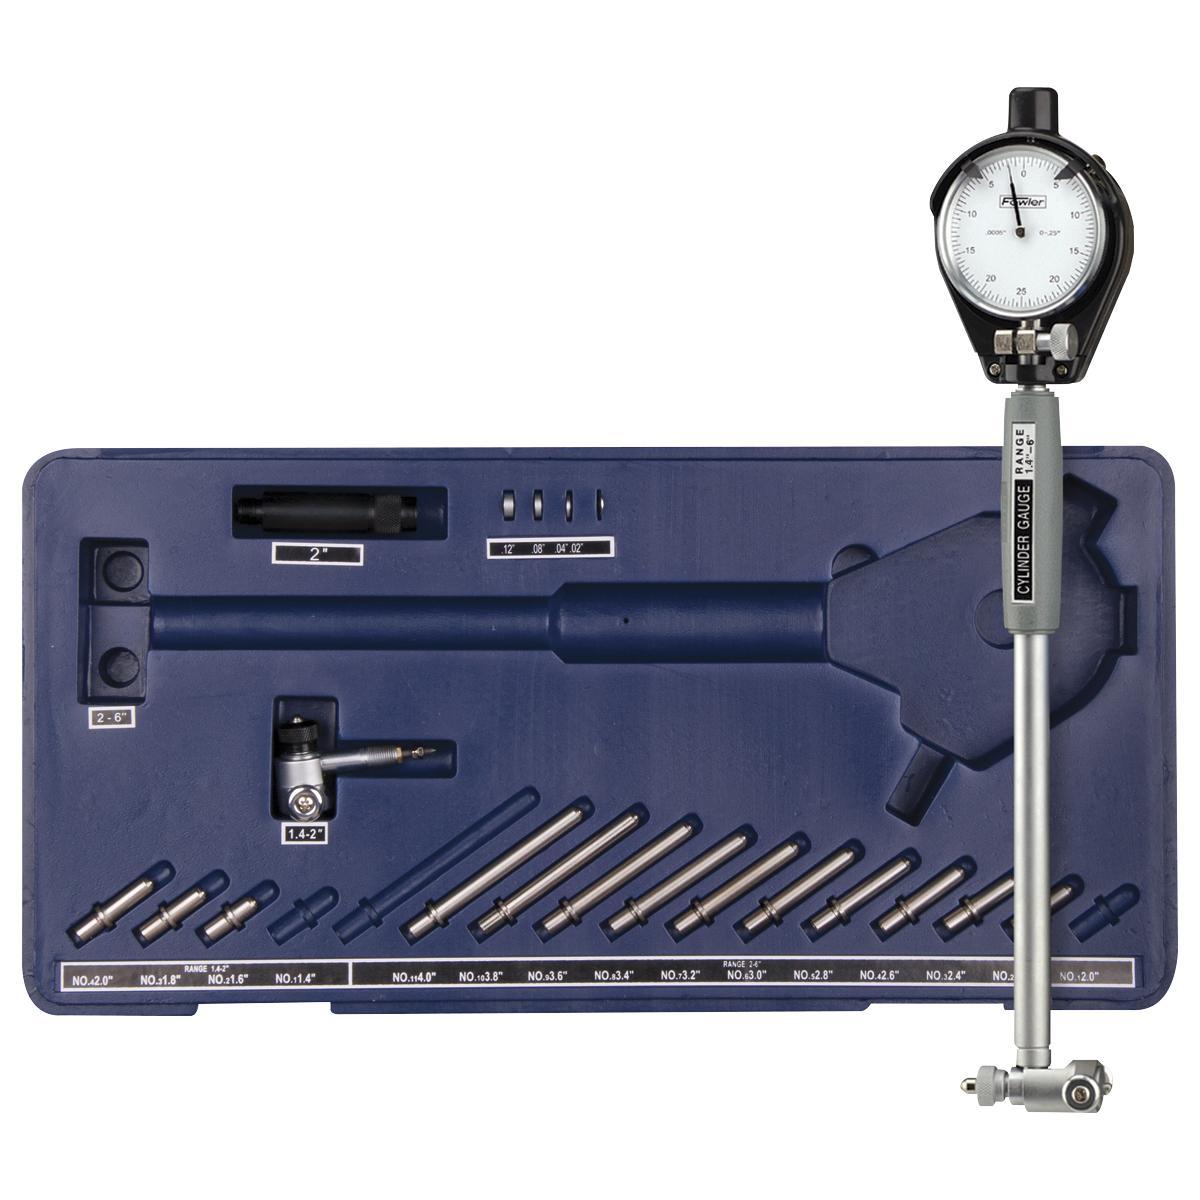 Fowler High Precision 72-483-777 4 Piece Deburring Cutter Set